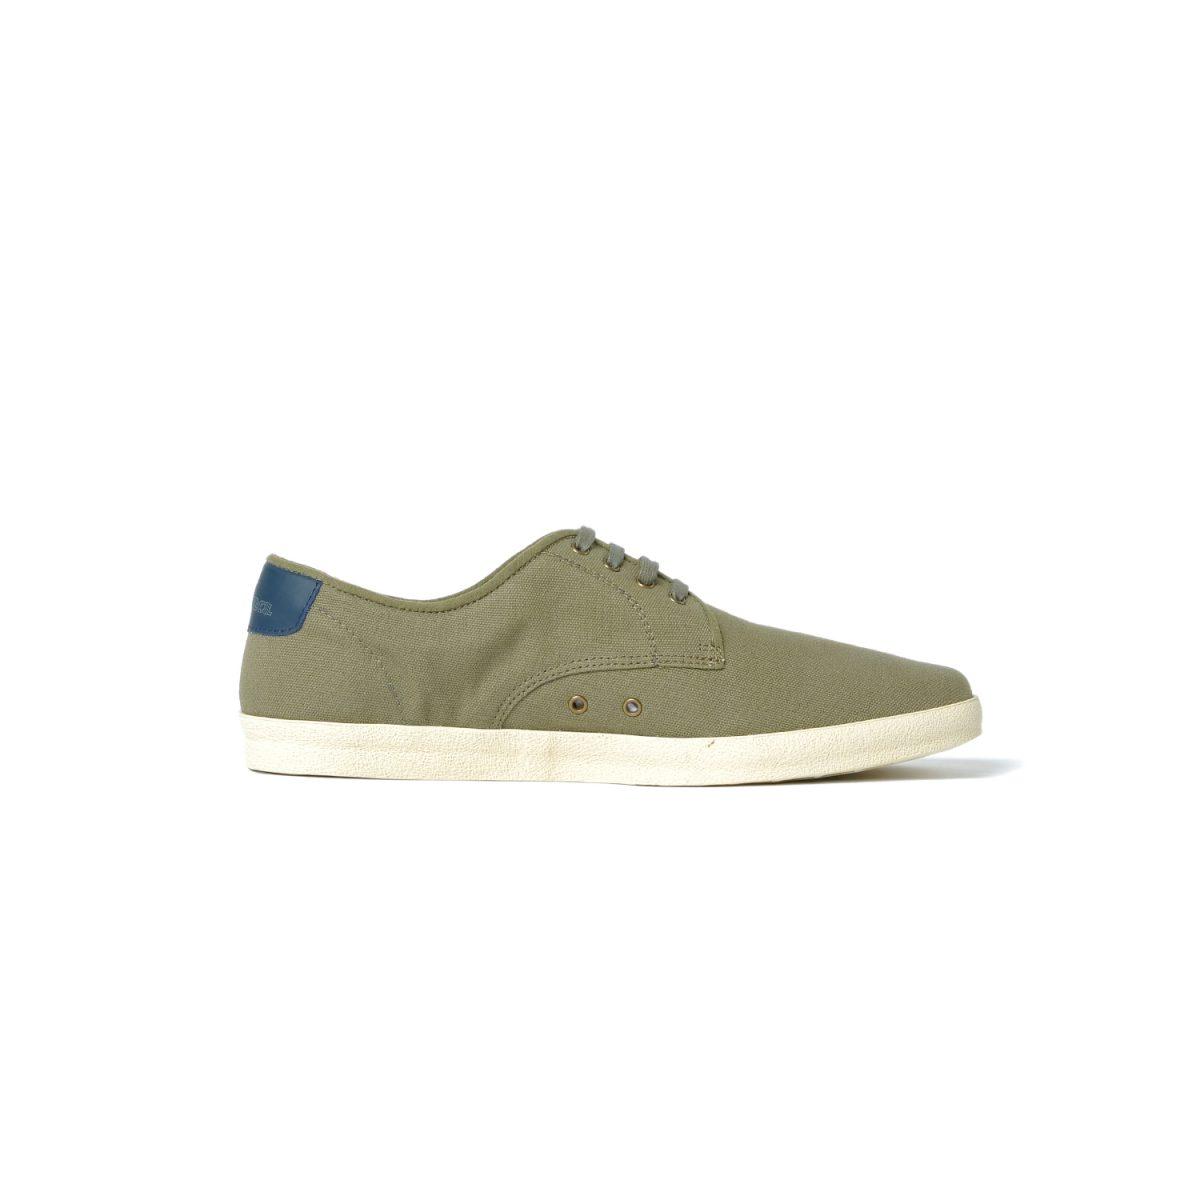 Tisza shoes - City - Olive-navy